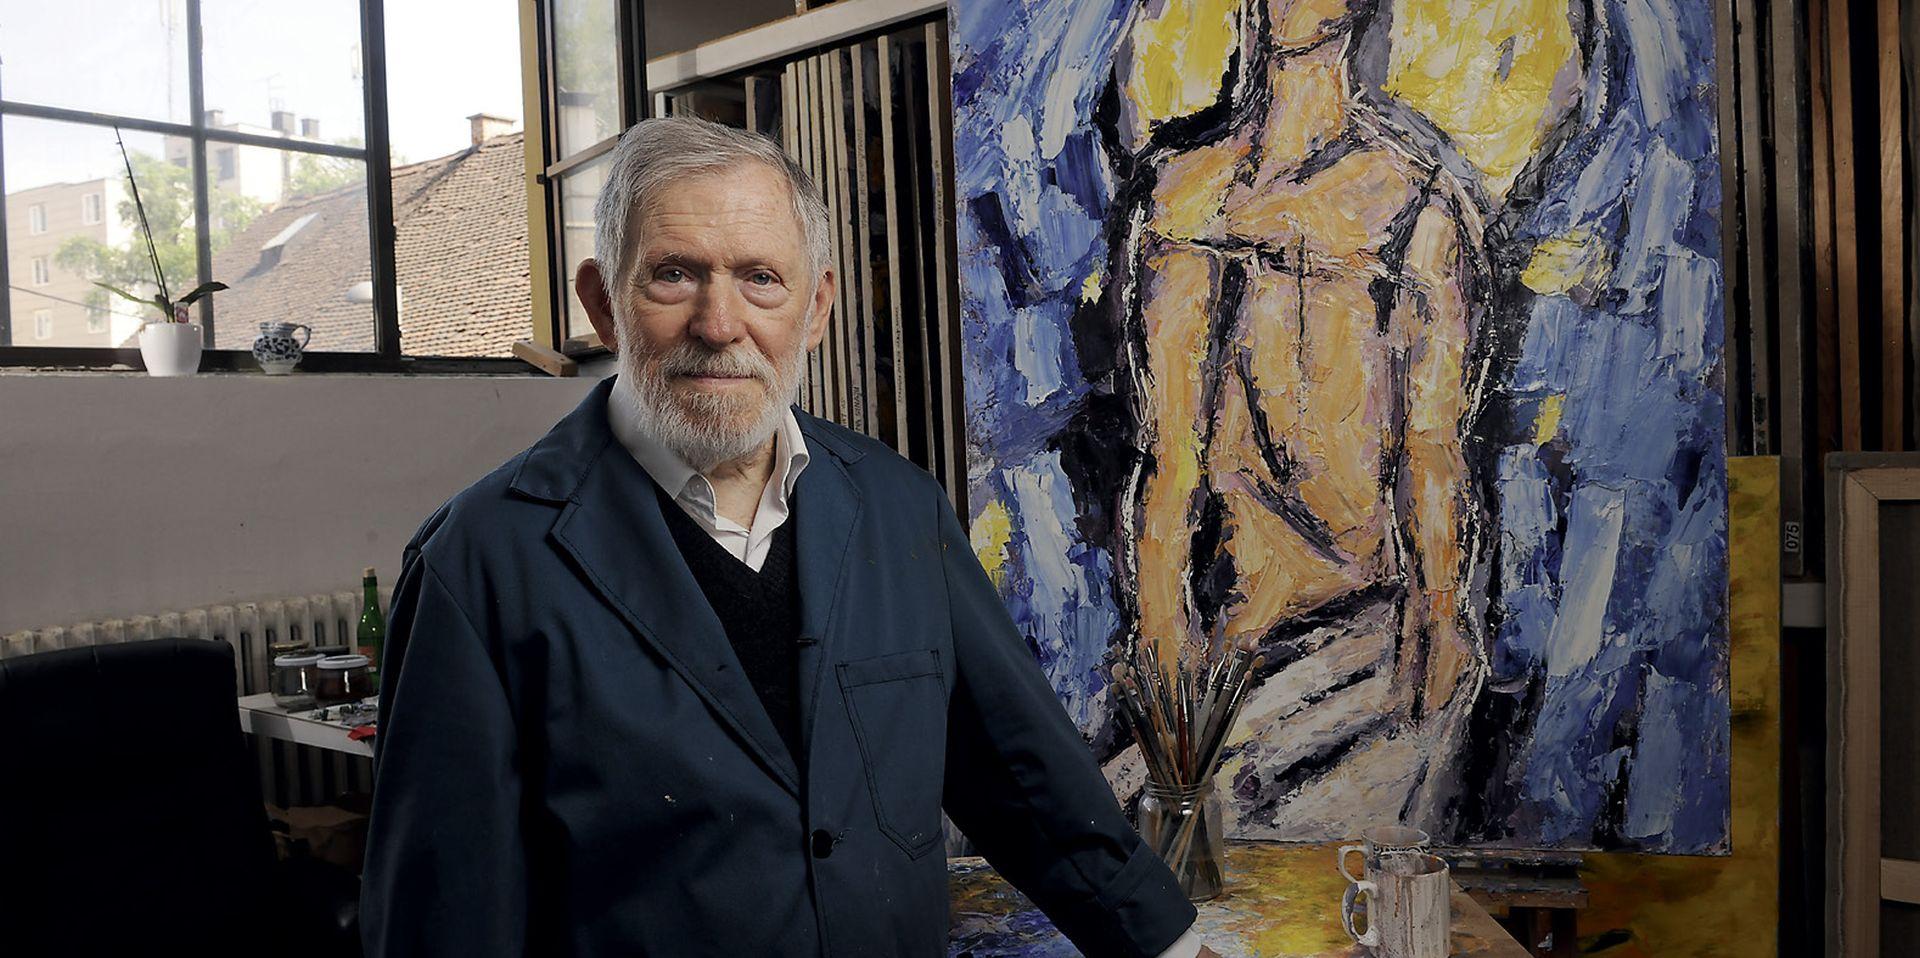 'Moj horizont je snažno slikarstvo. Gorgona bi mi bila preskučena'